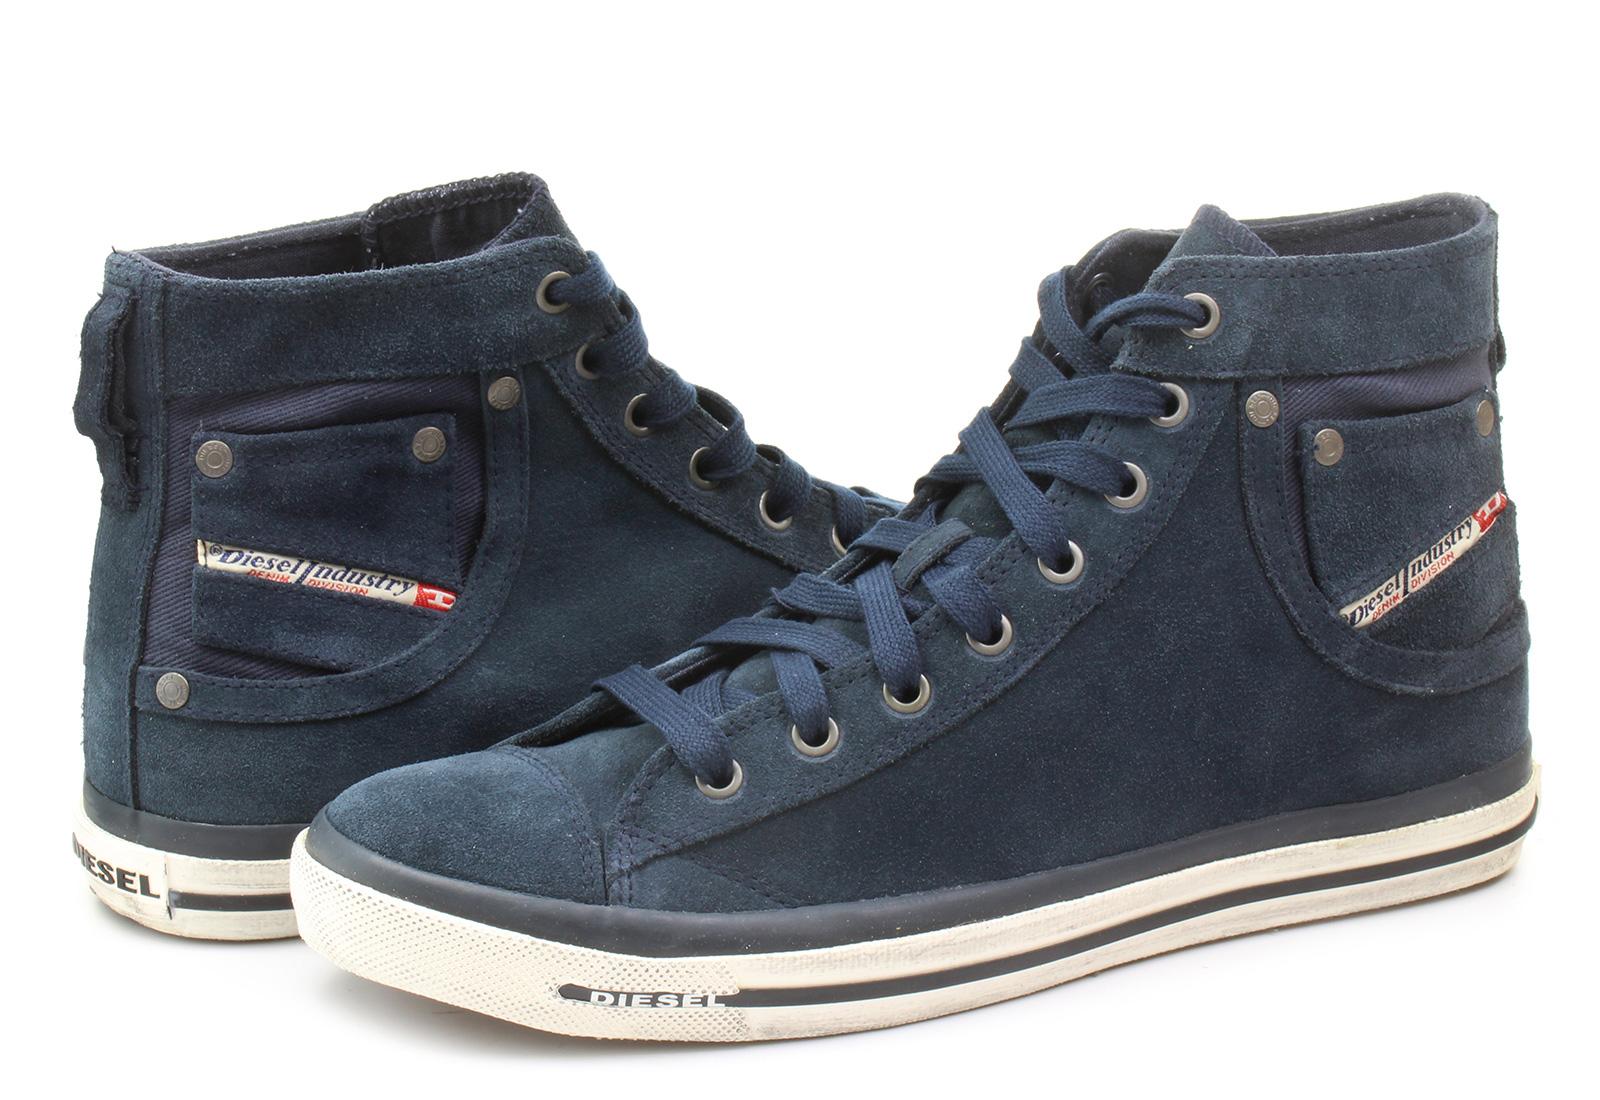 Diesel Shoes - Exposure I - 023-047-6059 - Online shop for ...